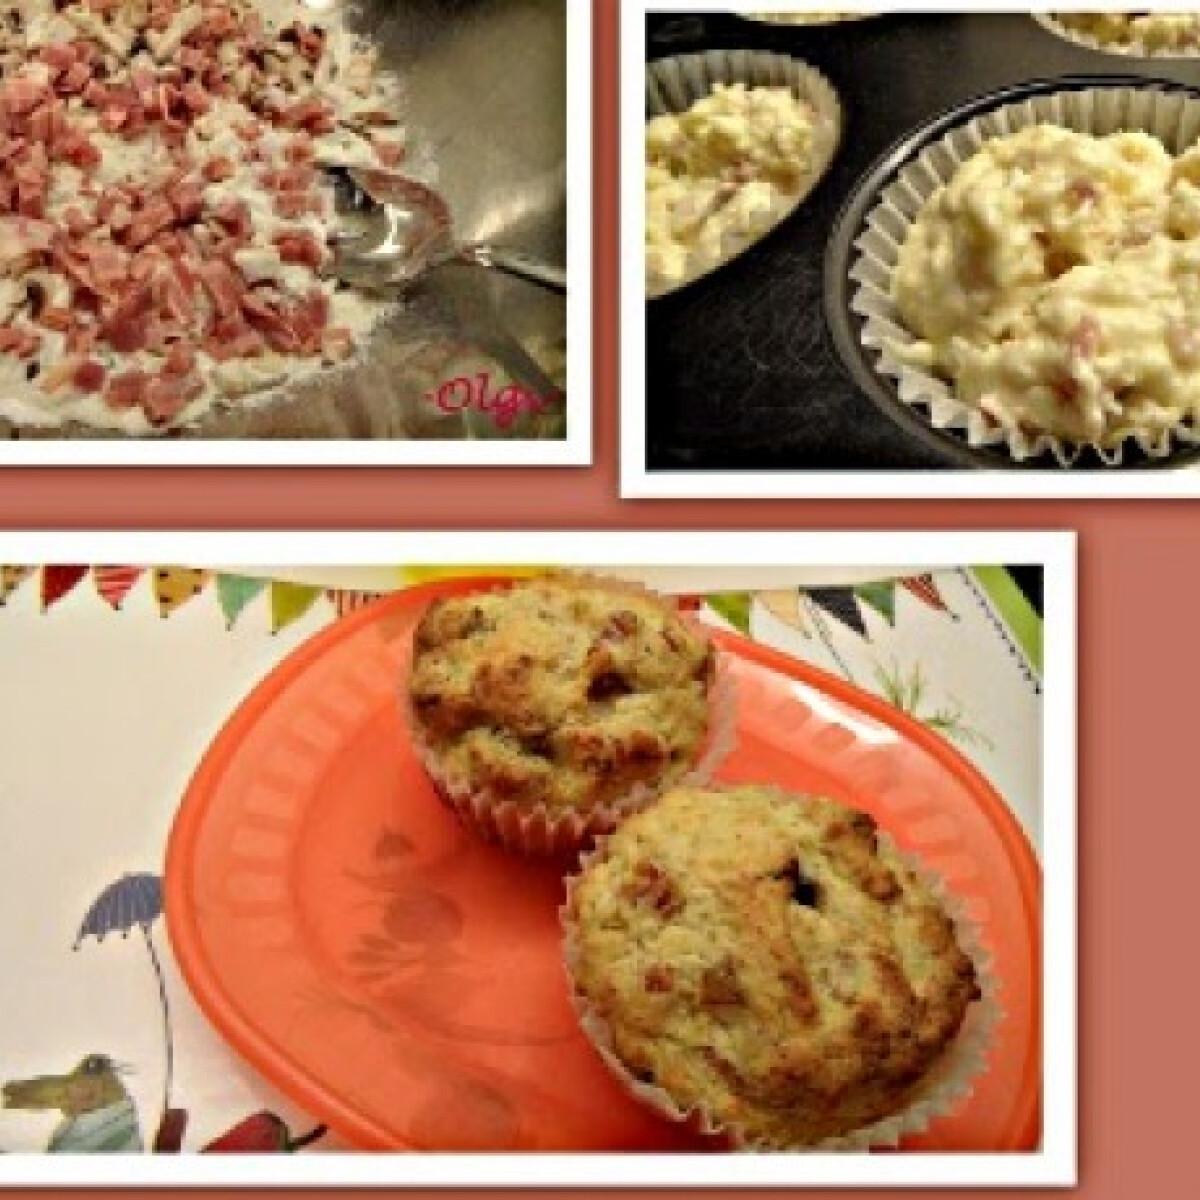 Sonkás-gombás-sajtos muffin Olgitól